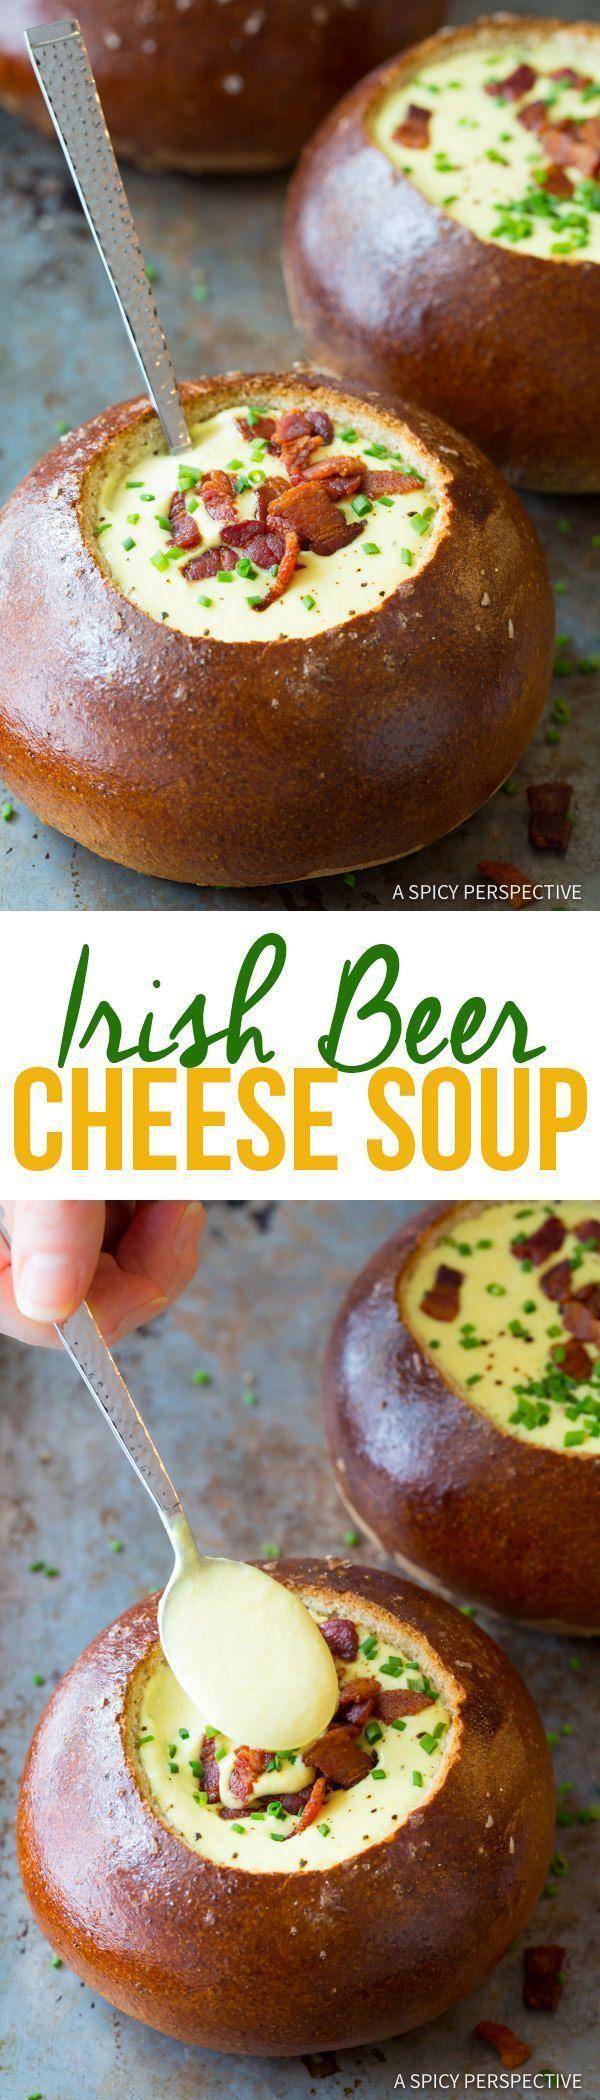 Irresistible Irish Beer Cheese Soup Recipe | http://ASpicyPerspective.com